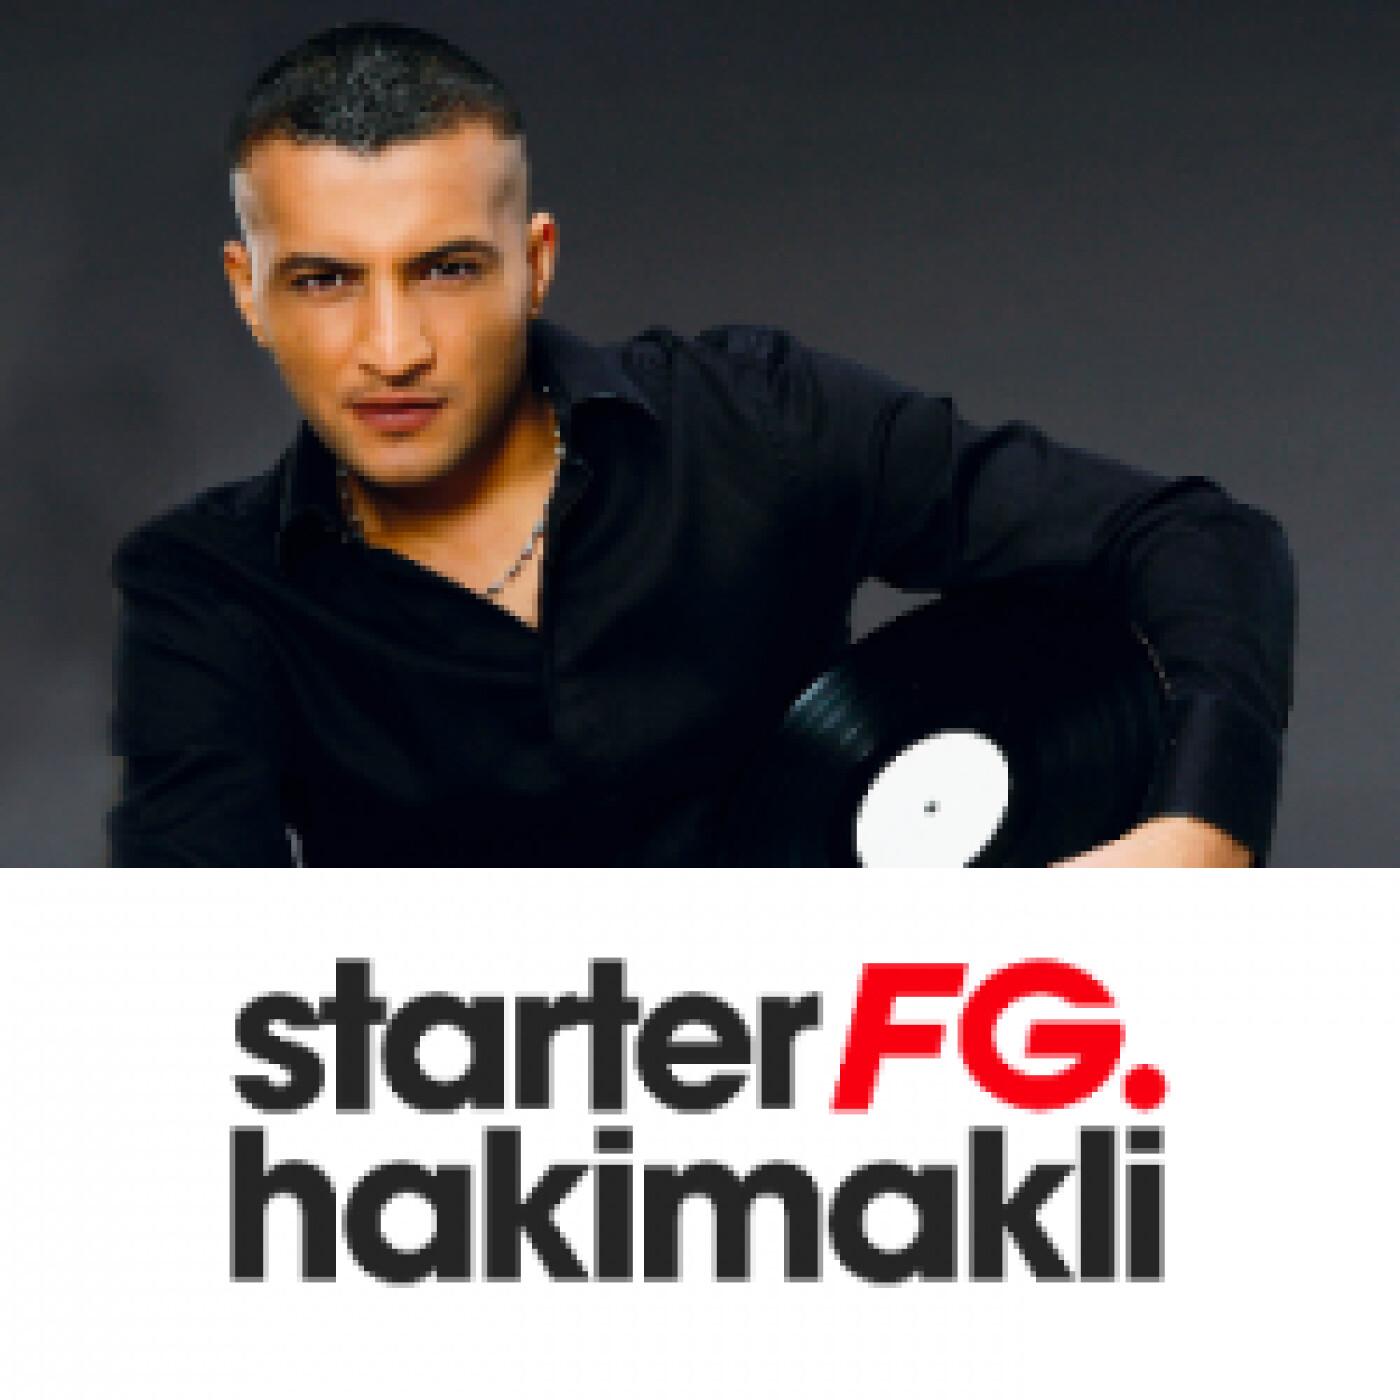 STARTER FG BY HAKIMAKLI MARDI 18 MAI 2021